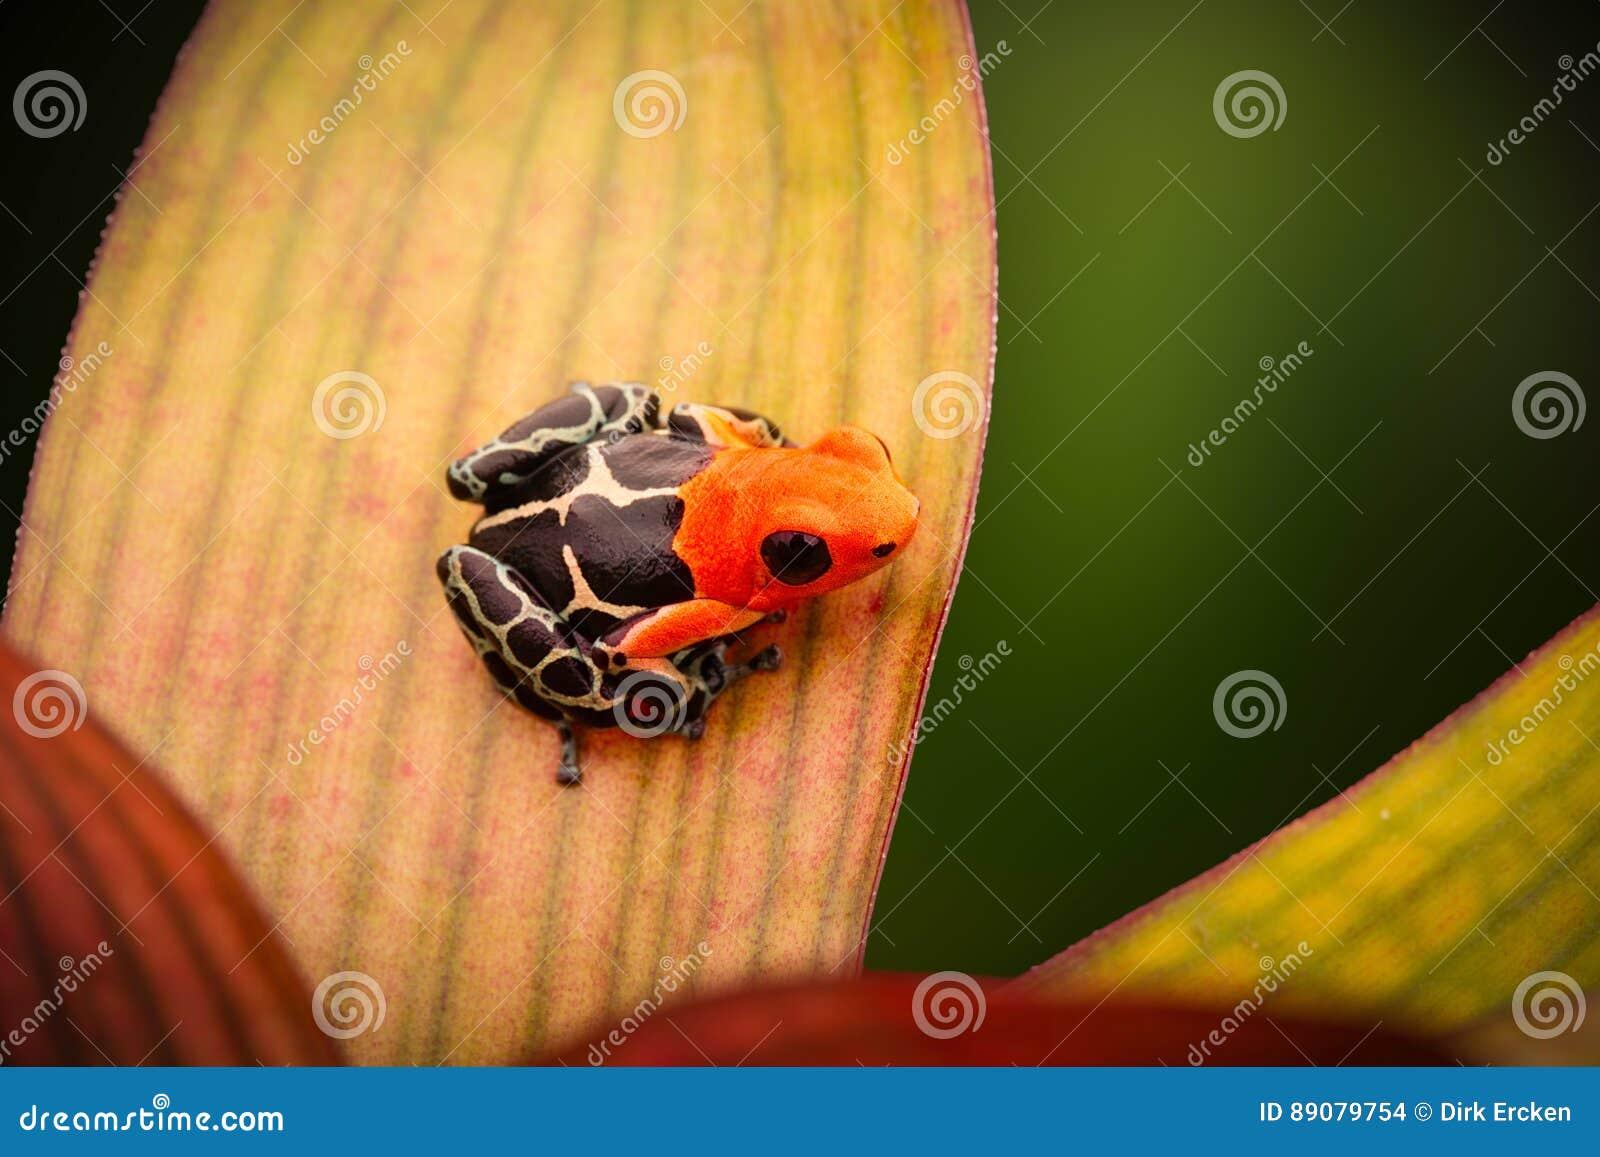 Poison dart or arrow frog, Ranitomeya fantastica